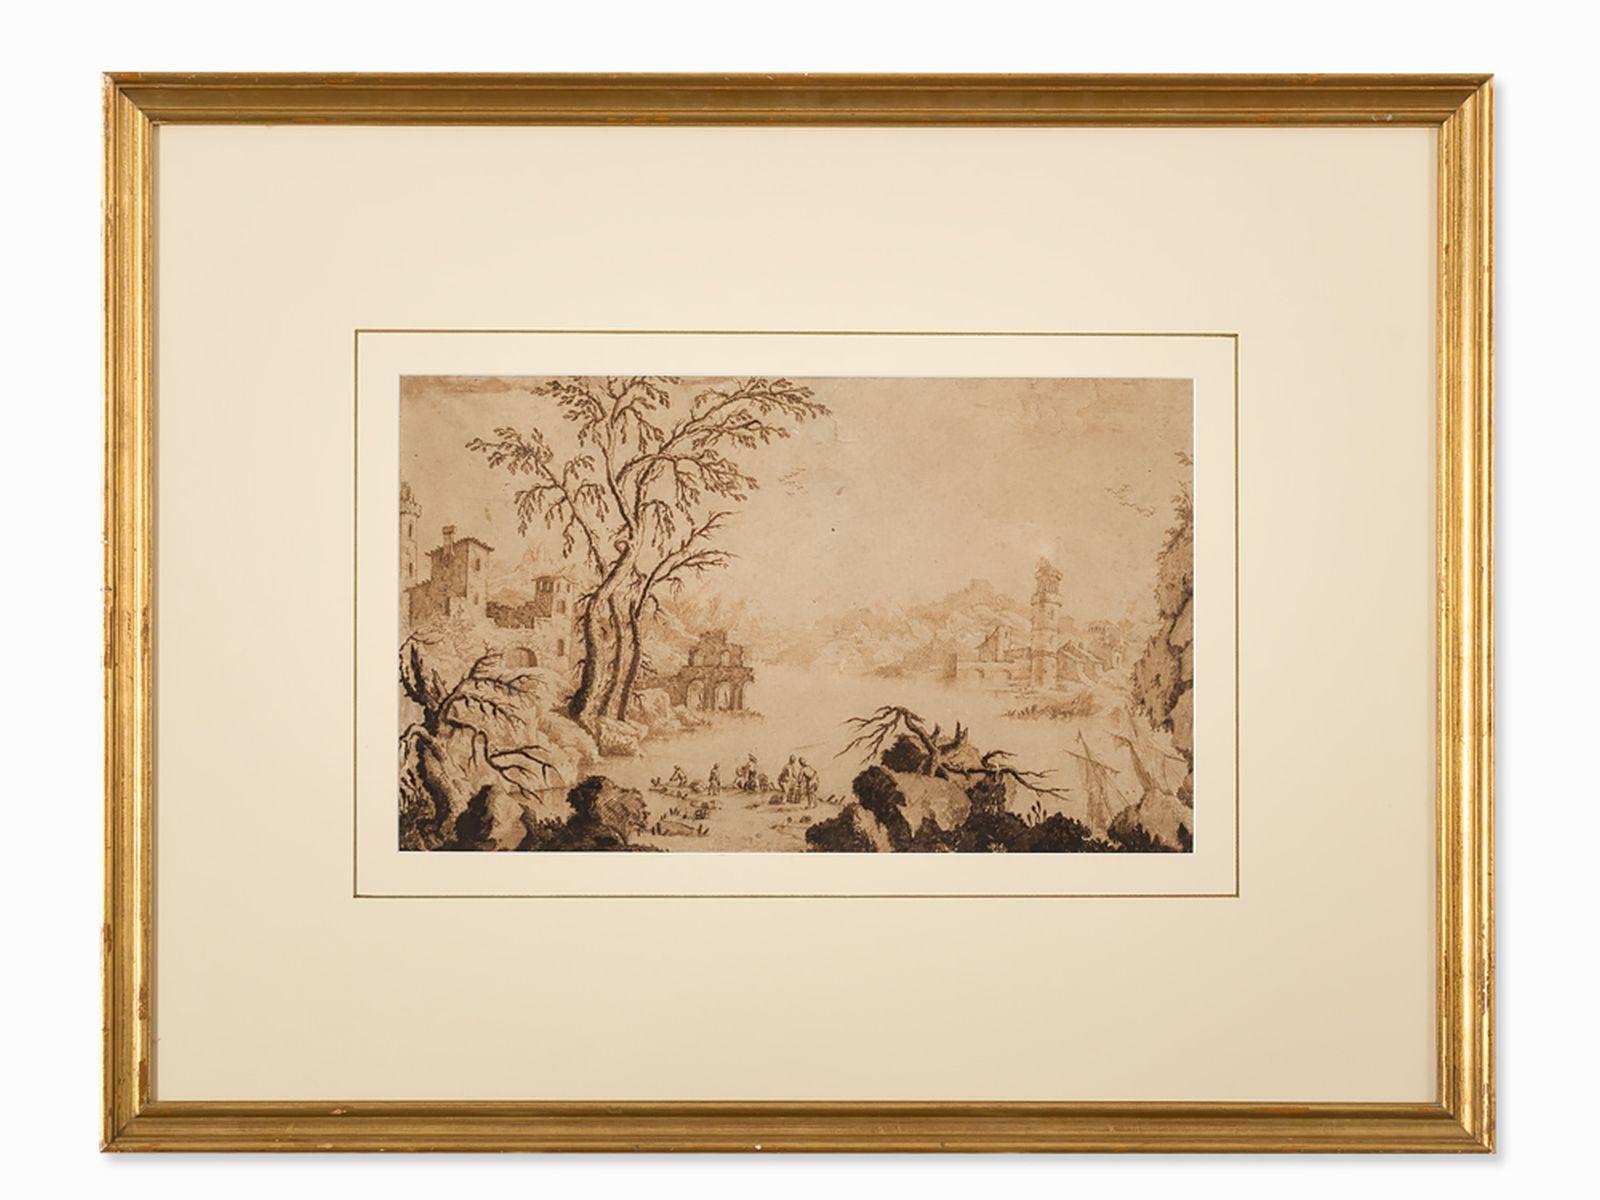 #14 Francesco Bosio (act. 1725-1756), River Landscape, 1 H. 18th C. |Francesco Bosio (tätig 1725-1756), Flusslandschaft, 1.H. 18.Jh. Image